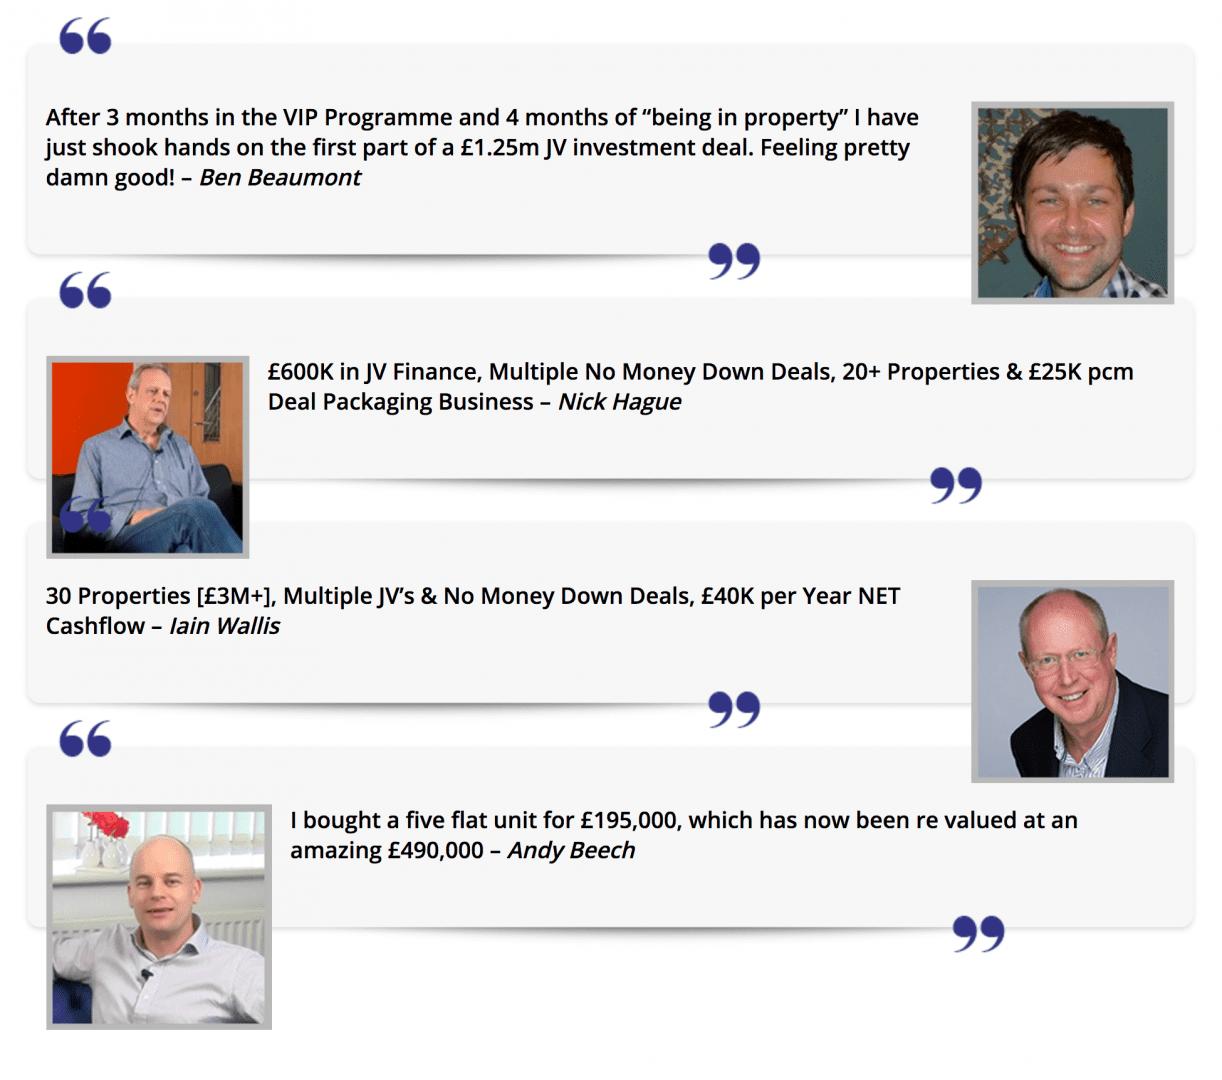 The Progressive Property VIP Programme